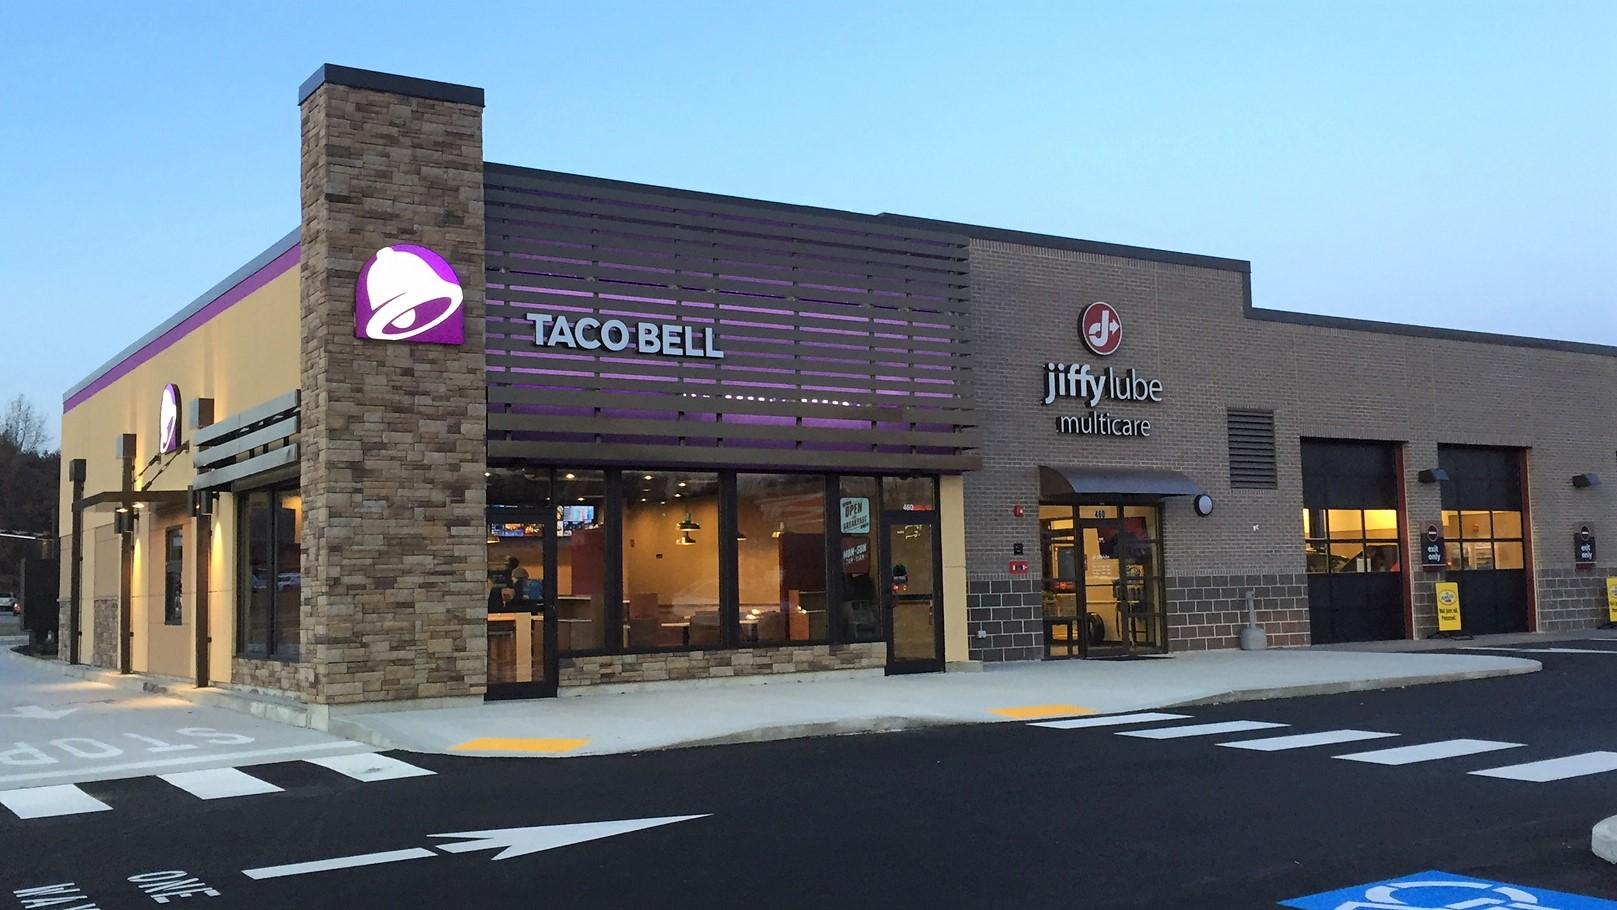 Taco Bell Jiffy Lube_Biddeford